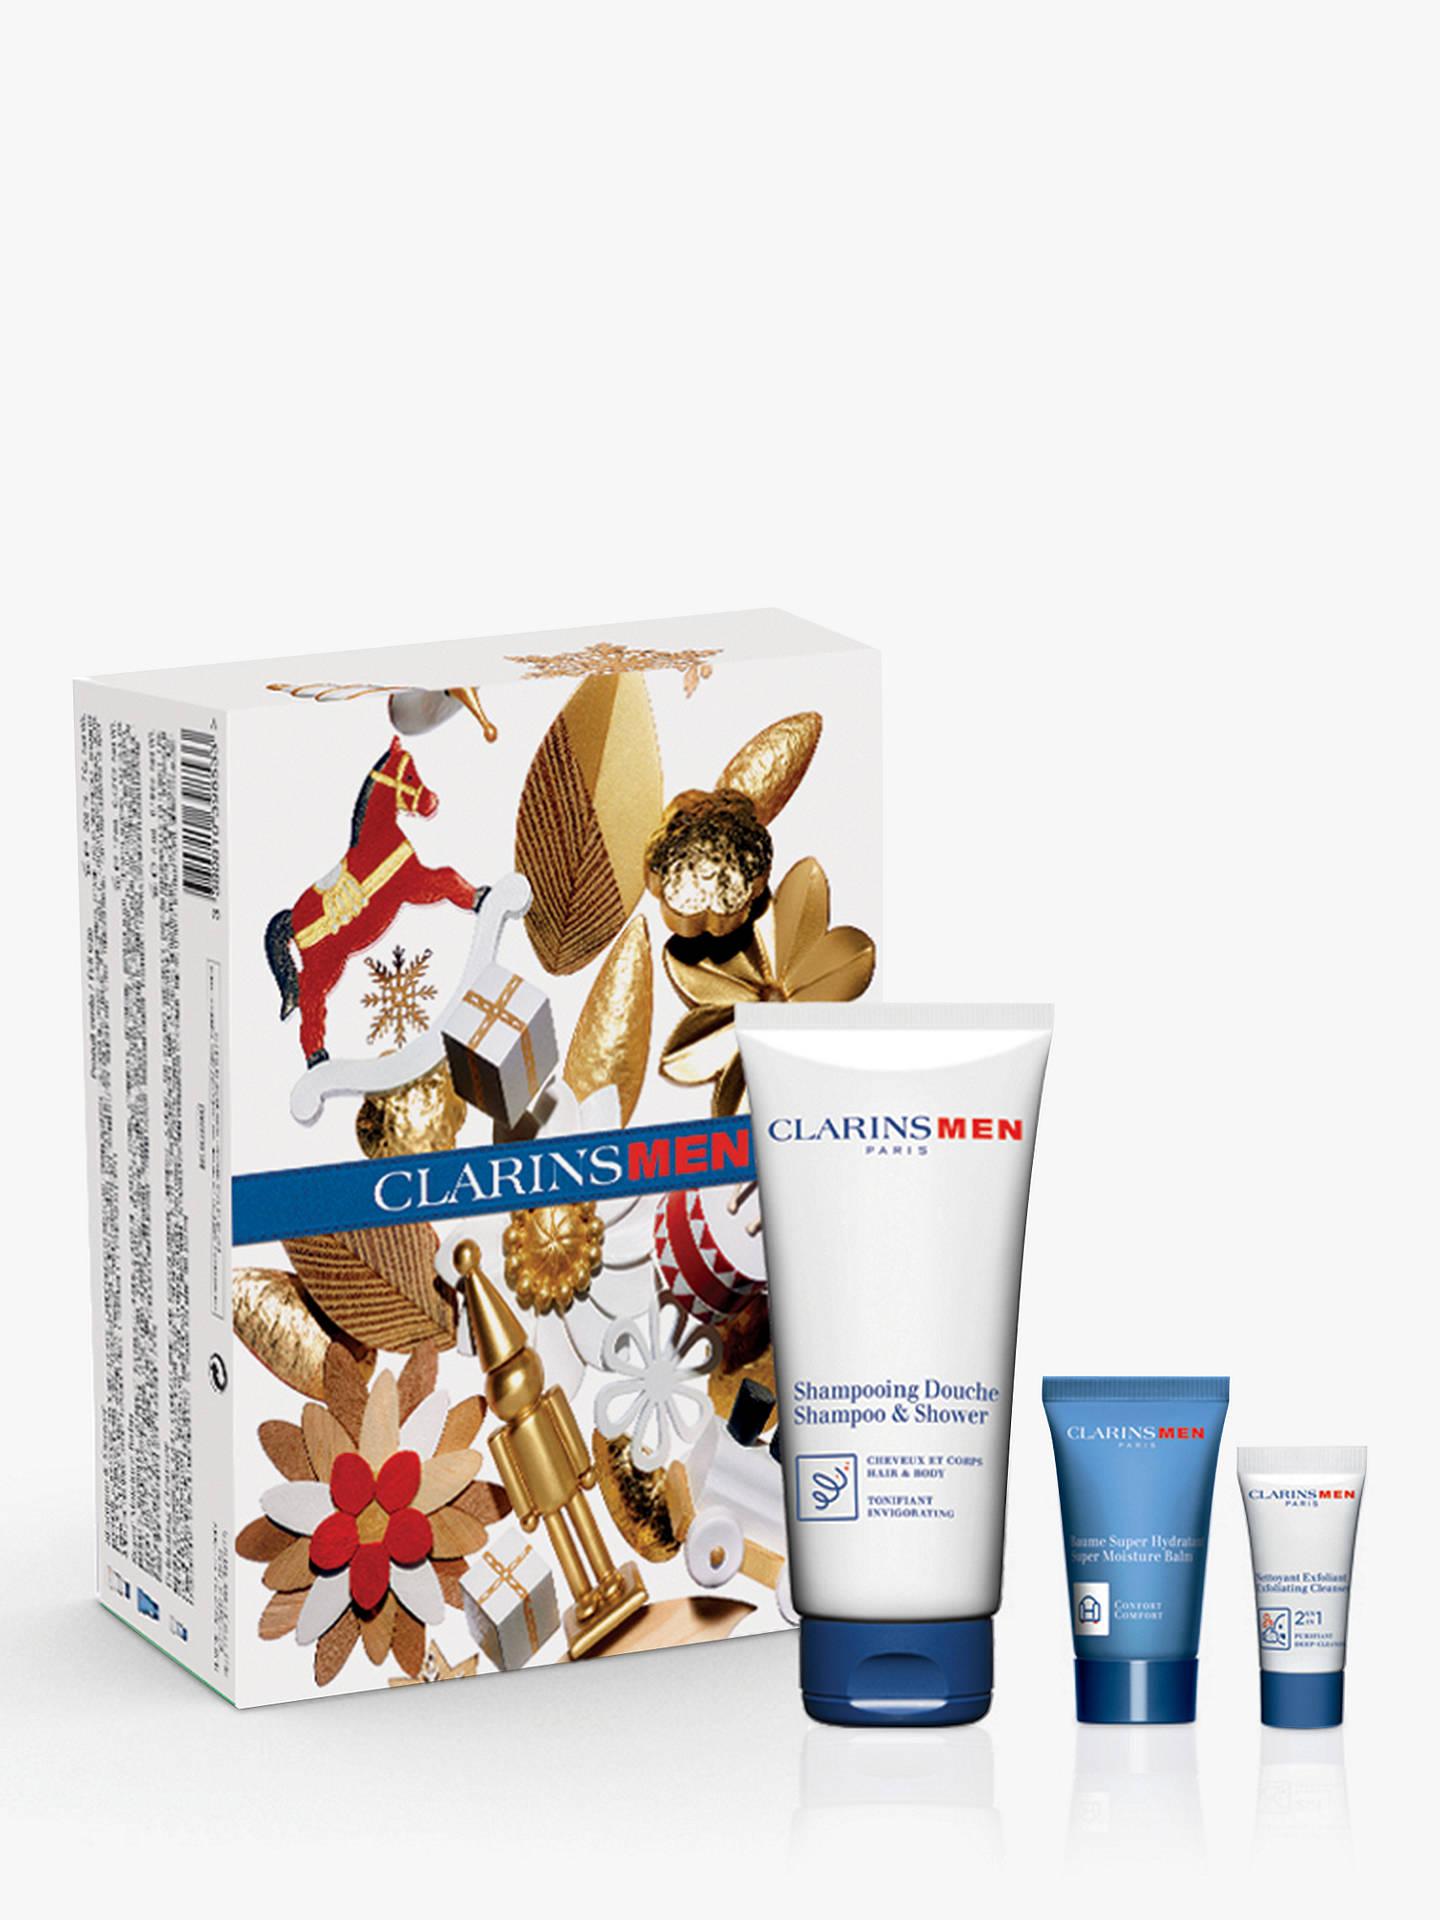 Clarins Clarins Men Start Up Skincare Gift Set by Clarins